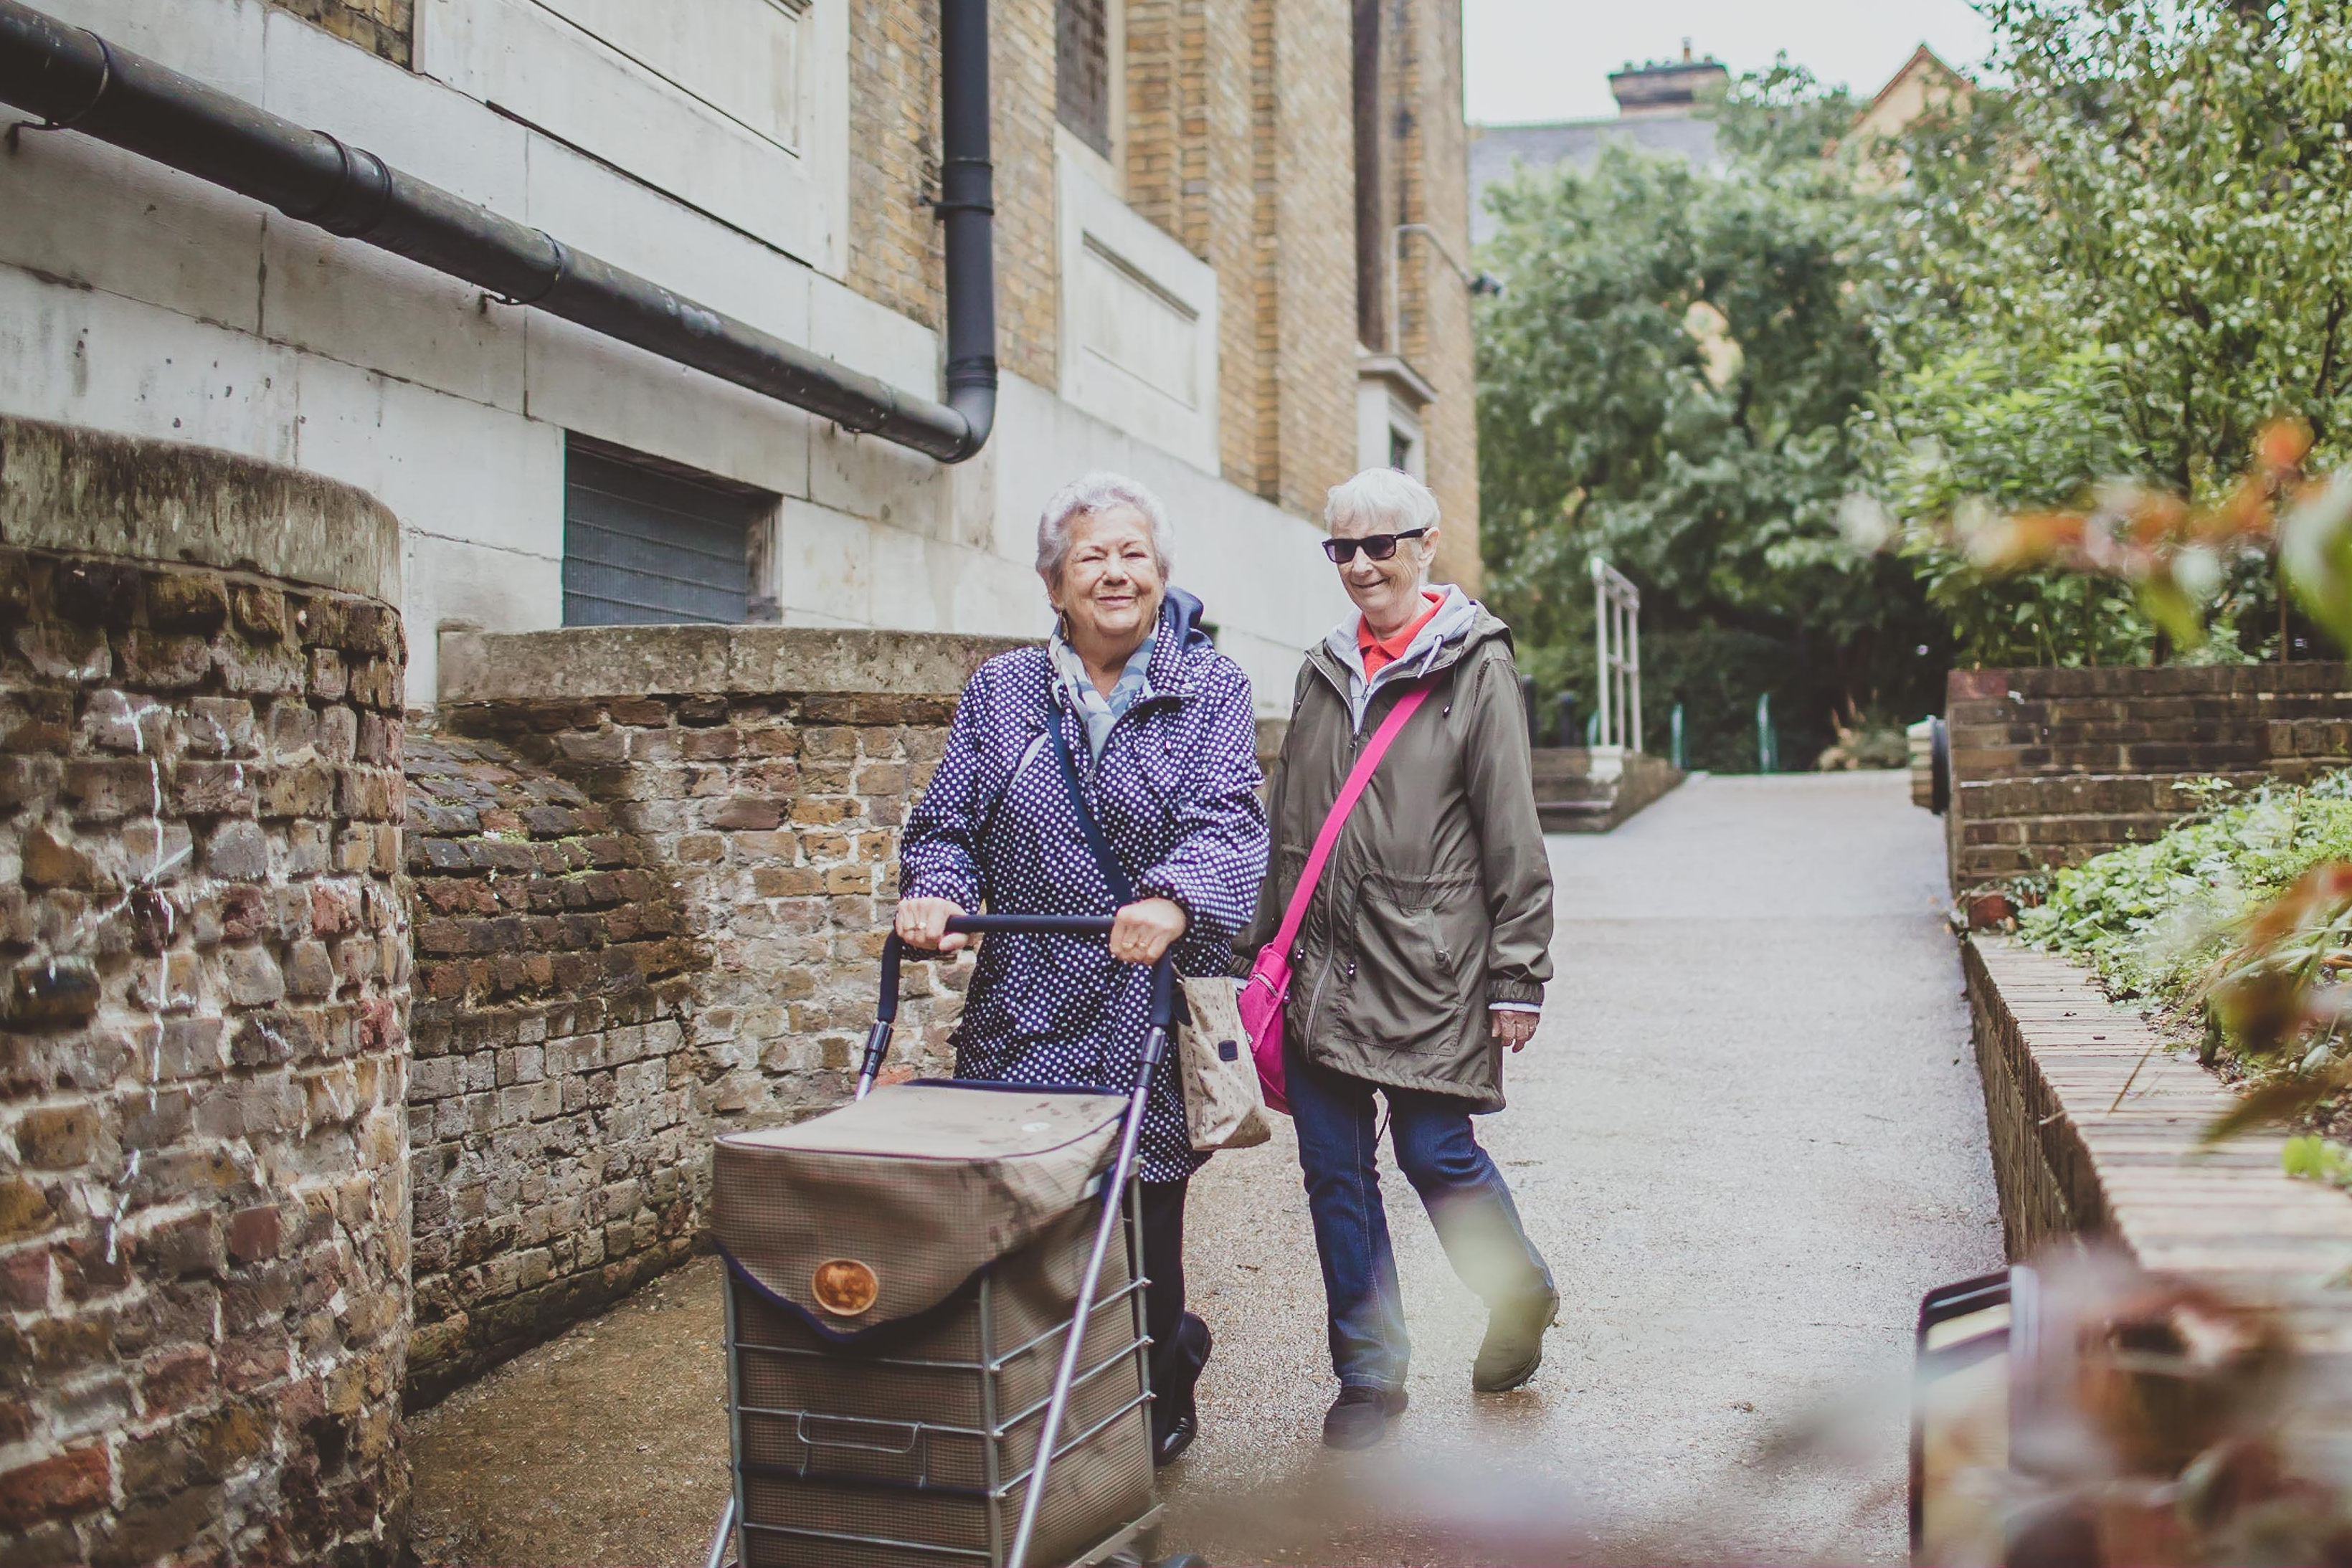 Two older ladies walking together